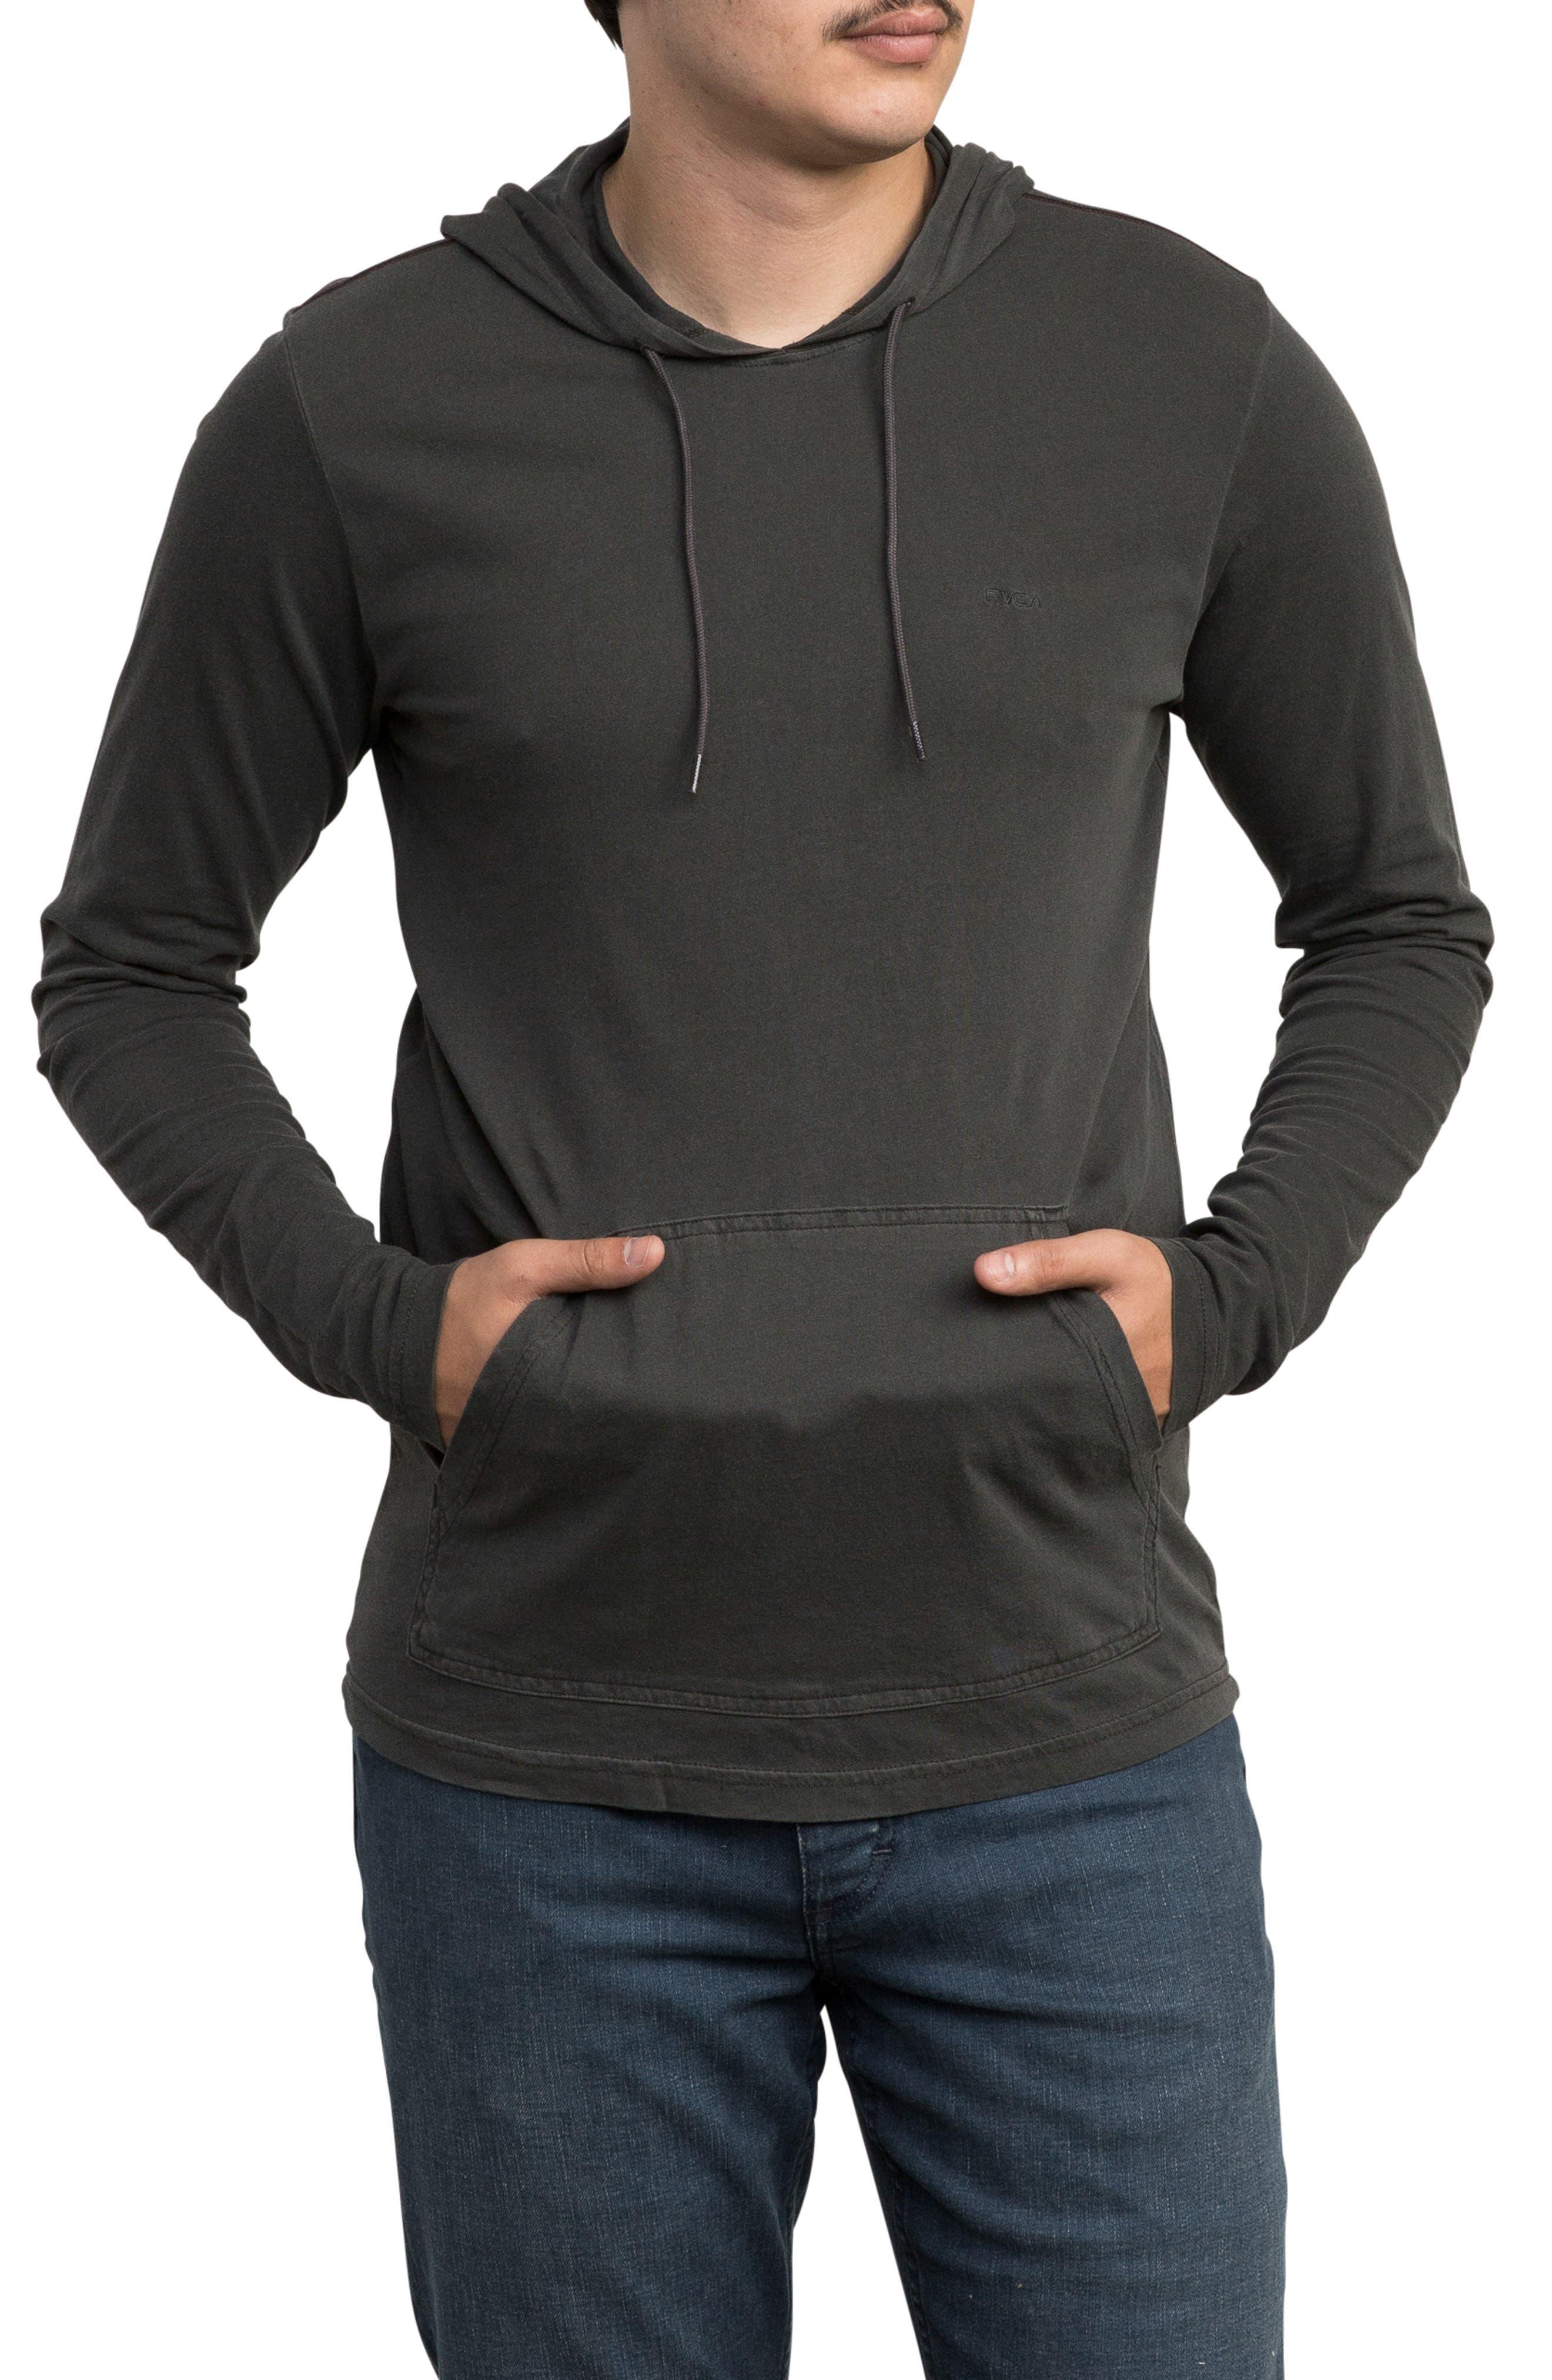 PTC Cotton Hoodie,                         Main,                         color, PIRATE BLACK